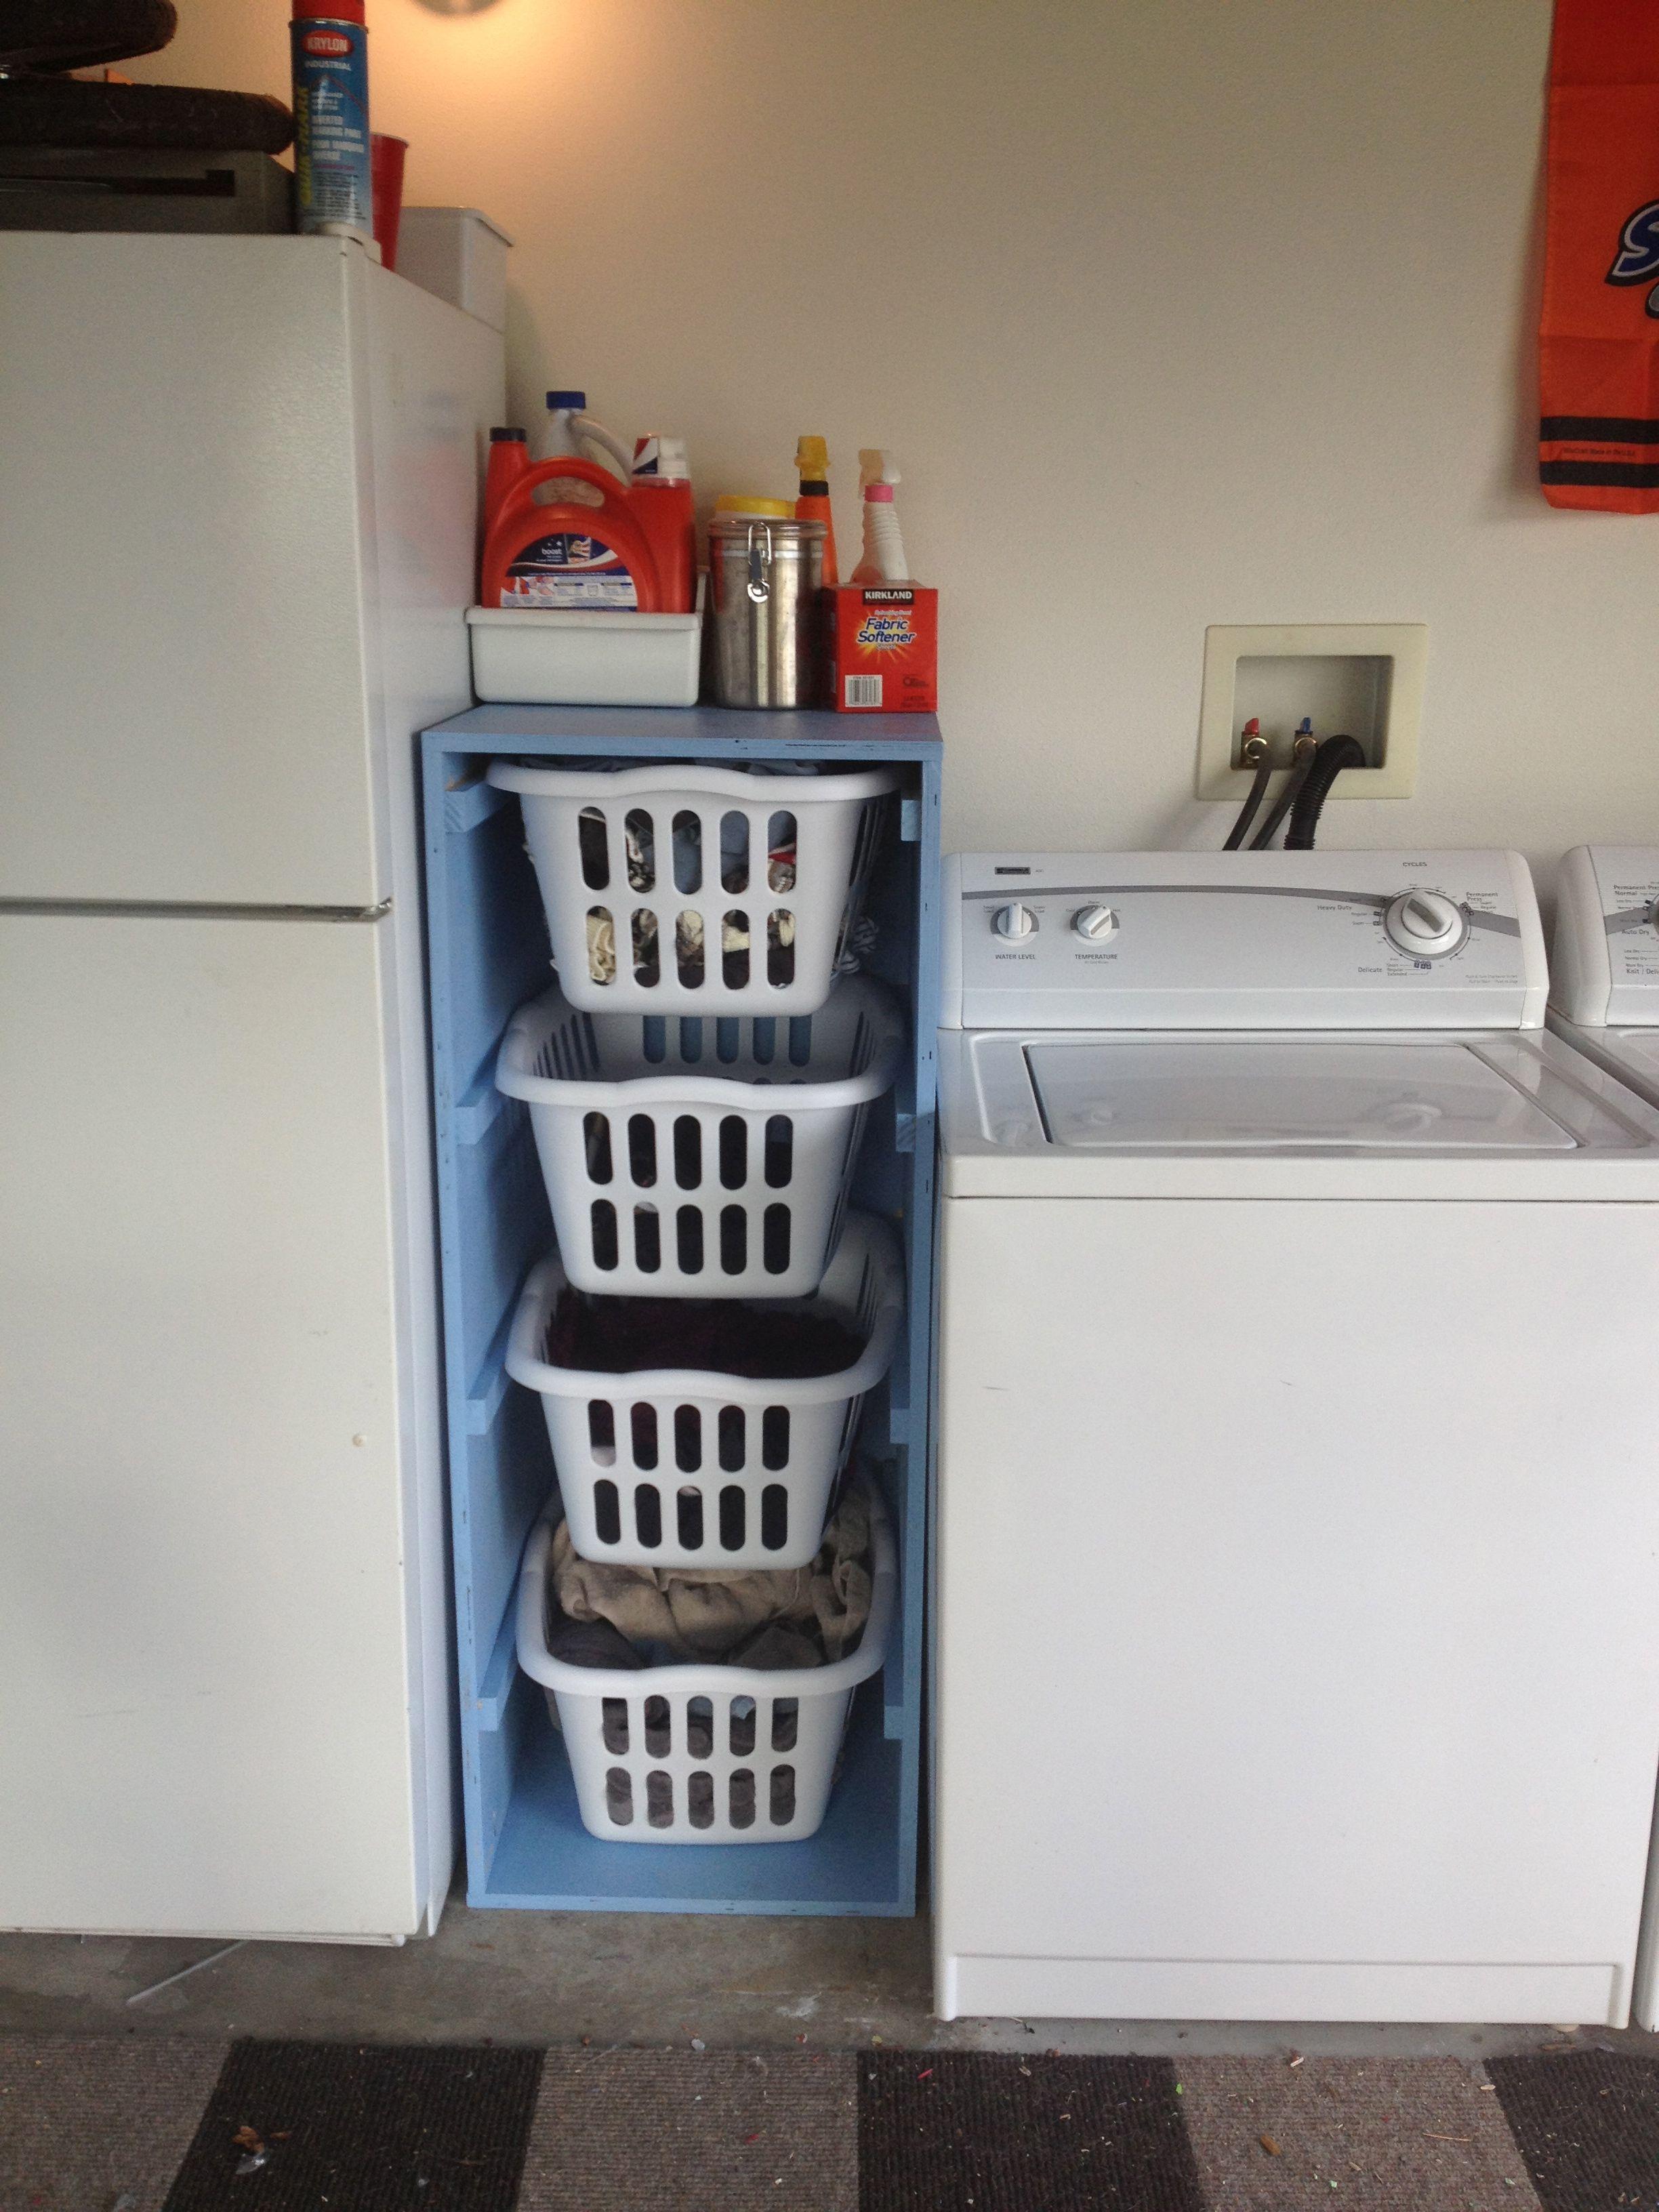 10 Great Laundry Room Diy Projects Laundry Room Diy Laundry Basket Dresser Diy Laundry